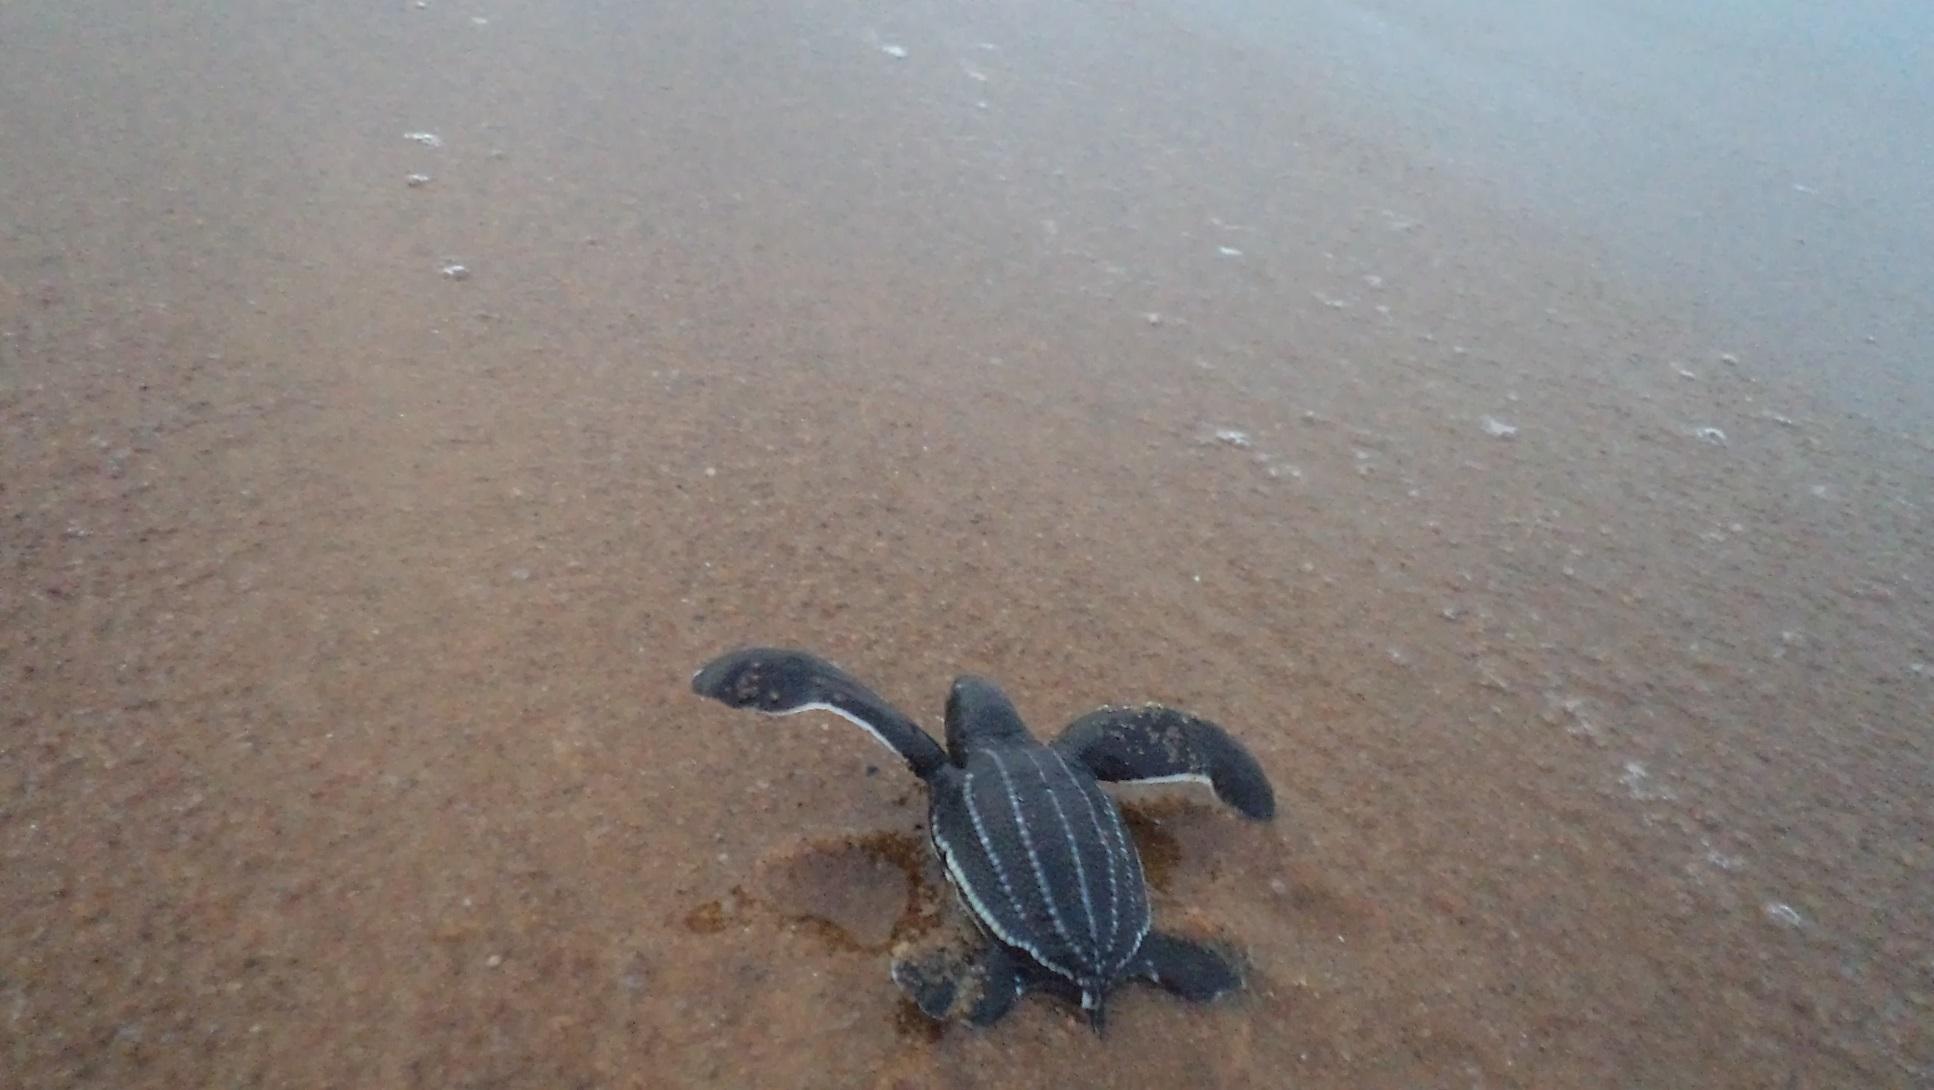 Junge Lederschildkröte, Dermochelys coriacea auf dem Weg ins Meer